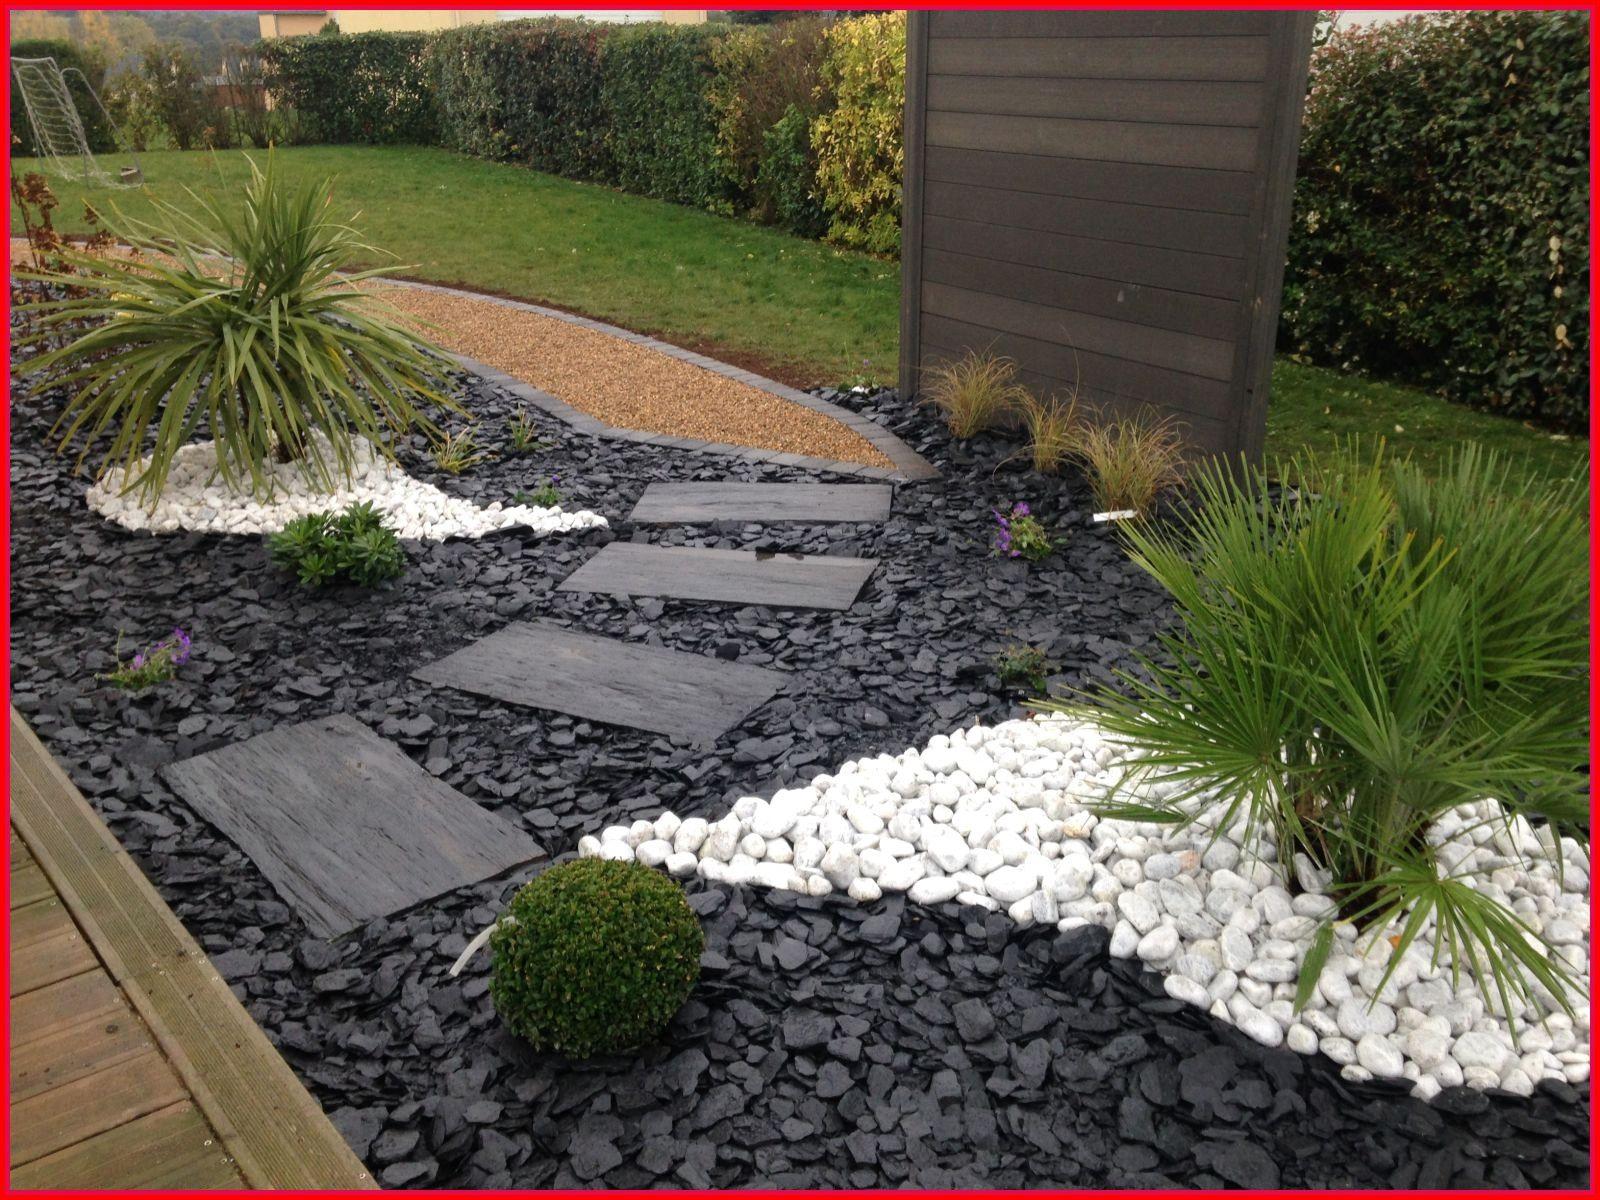 Deco Galet Jardin - Leader De La Construction Individuelle ... concernant Ardoise Deco Jardin